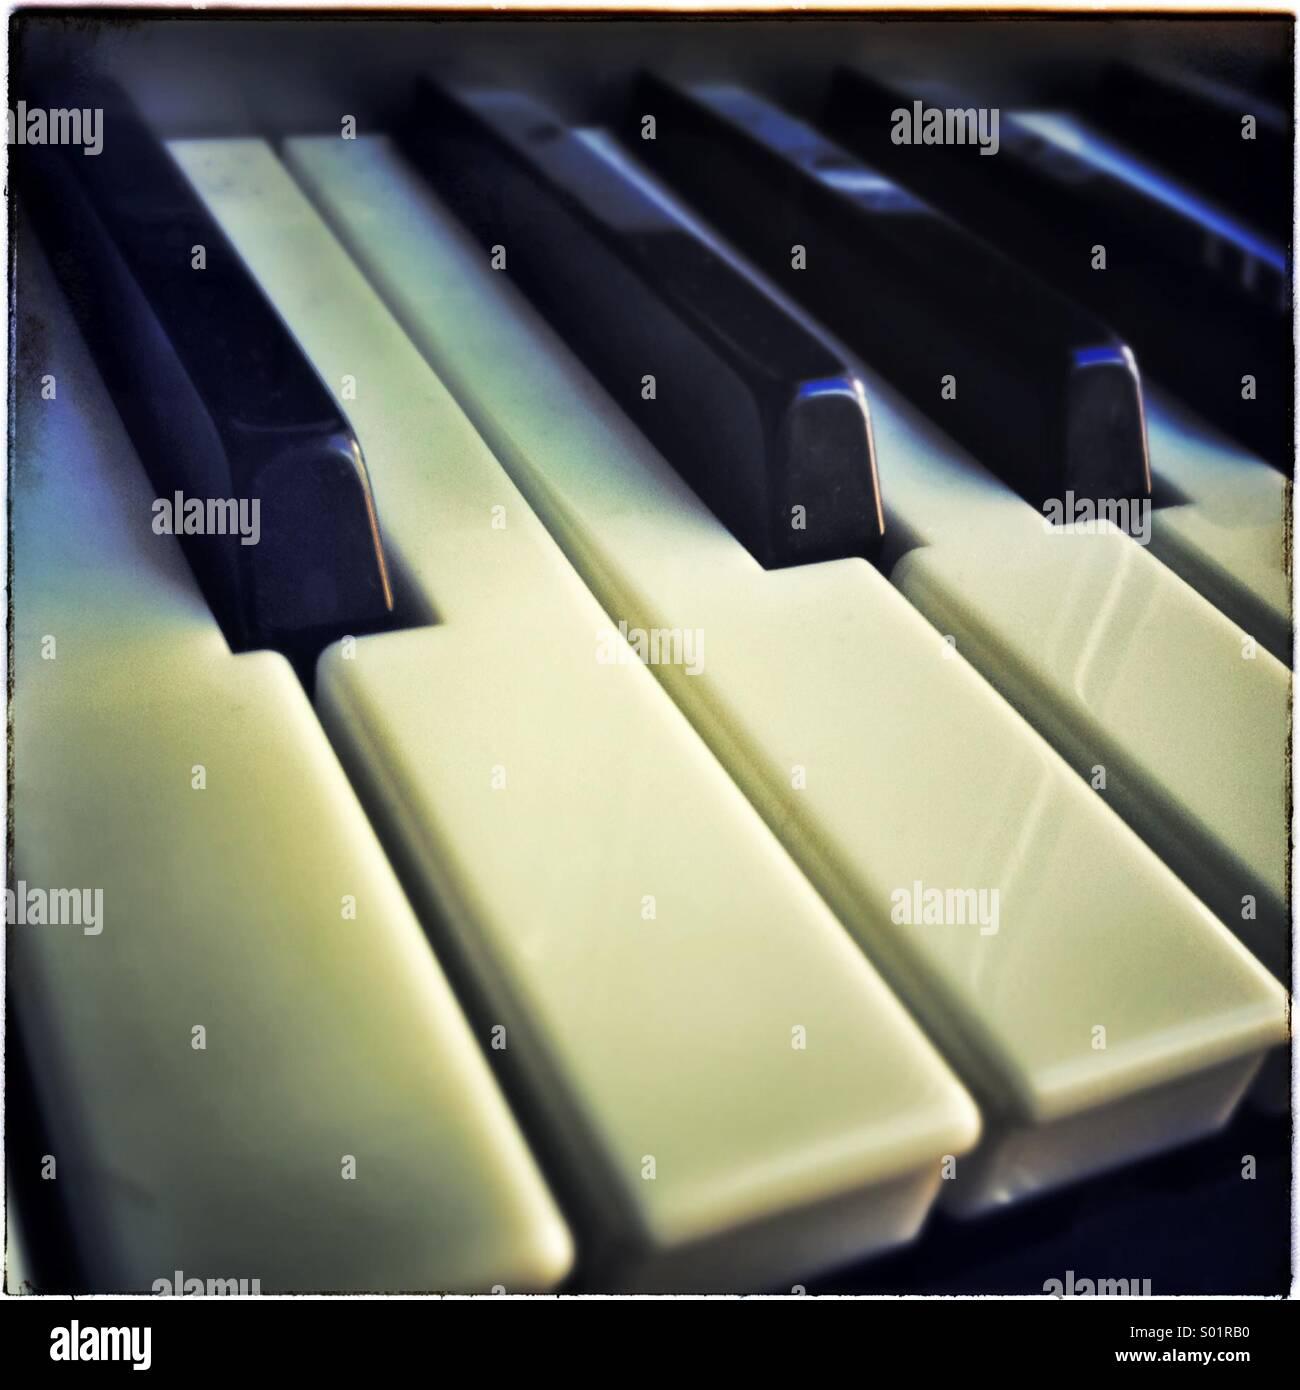 Piano keys close up - Stock Image